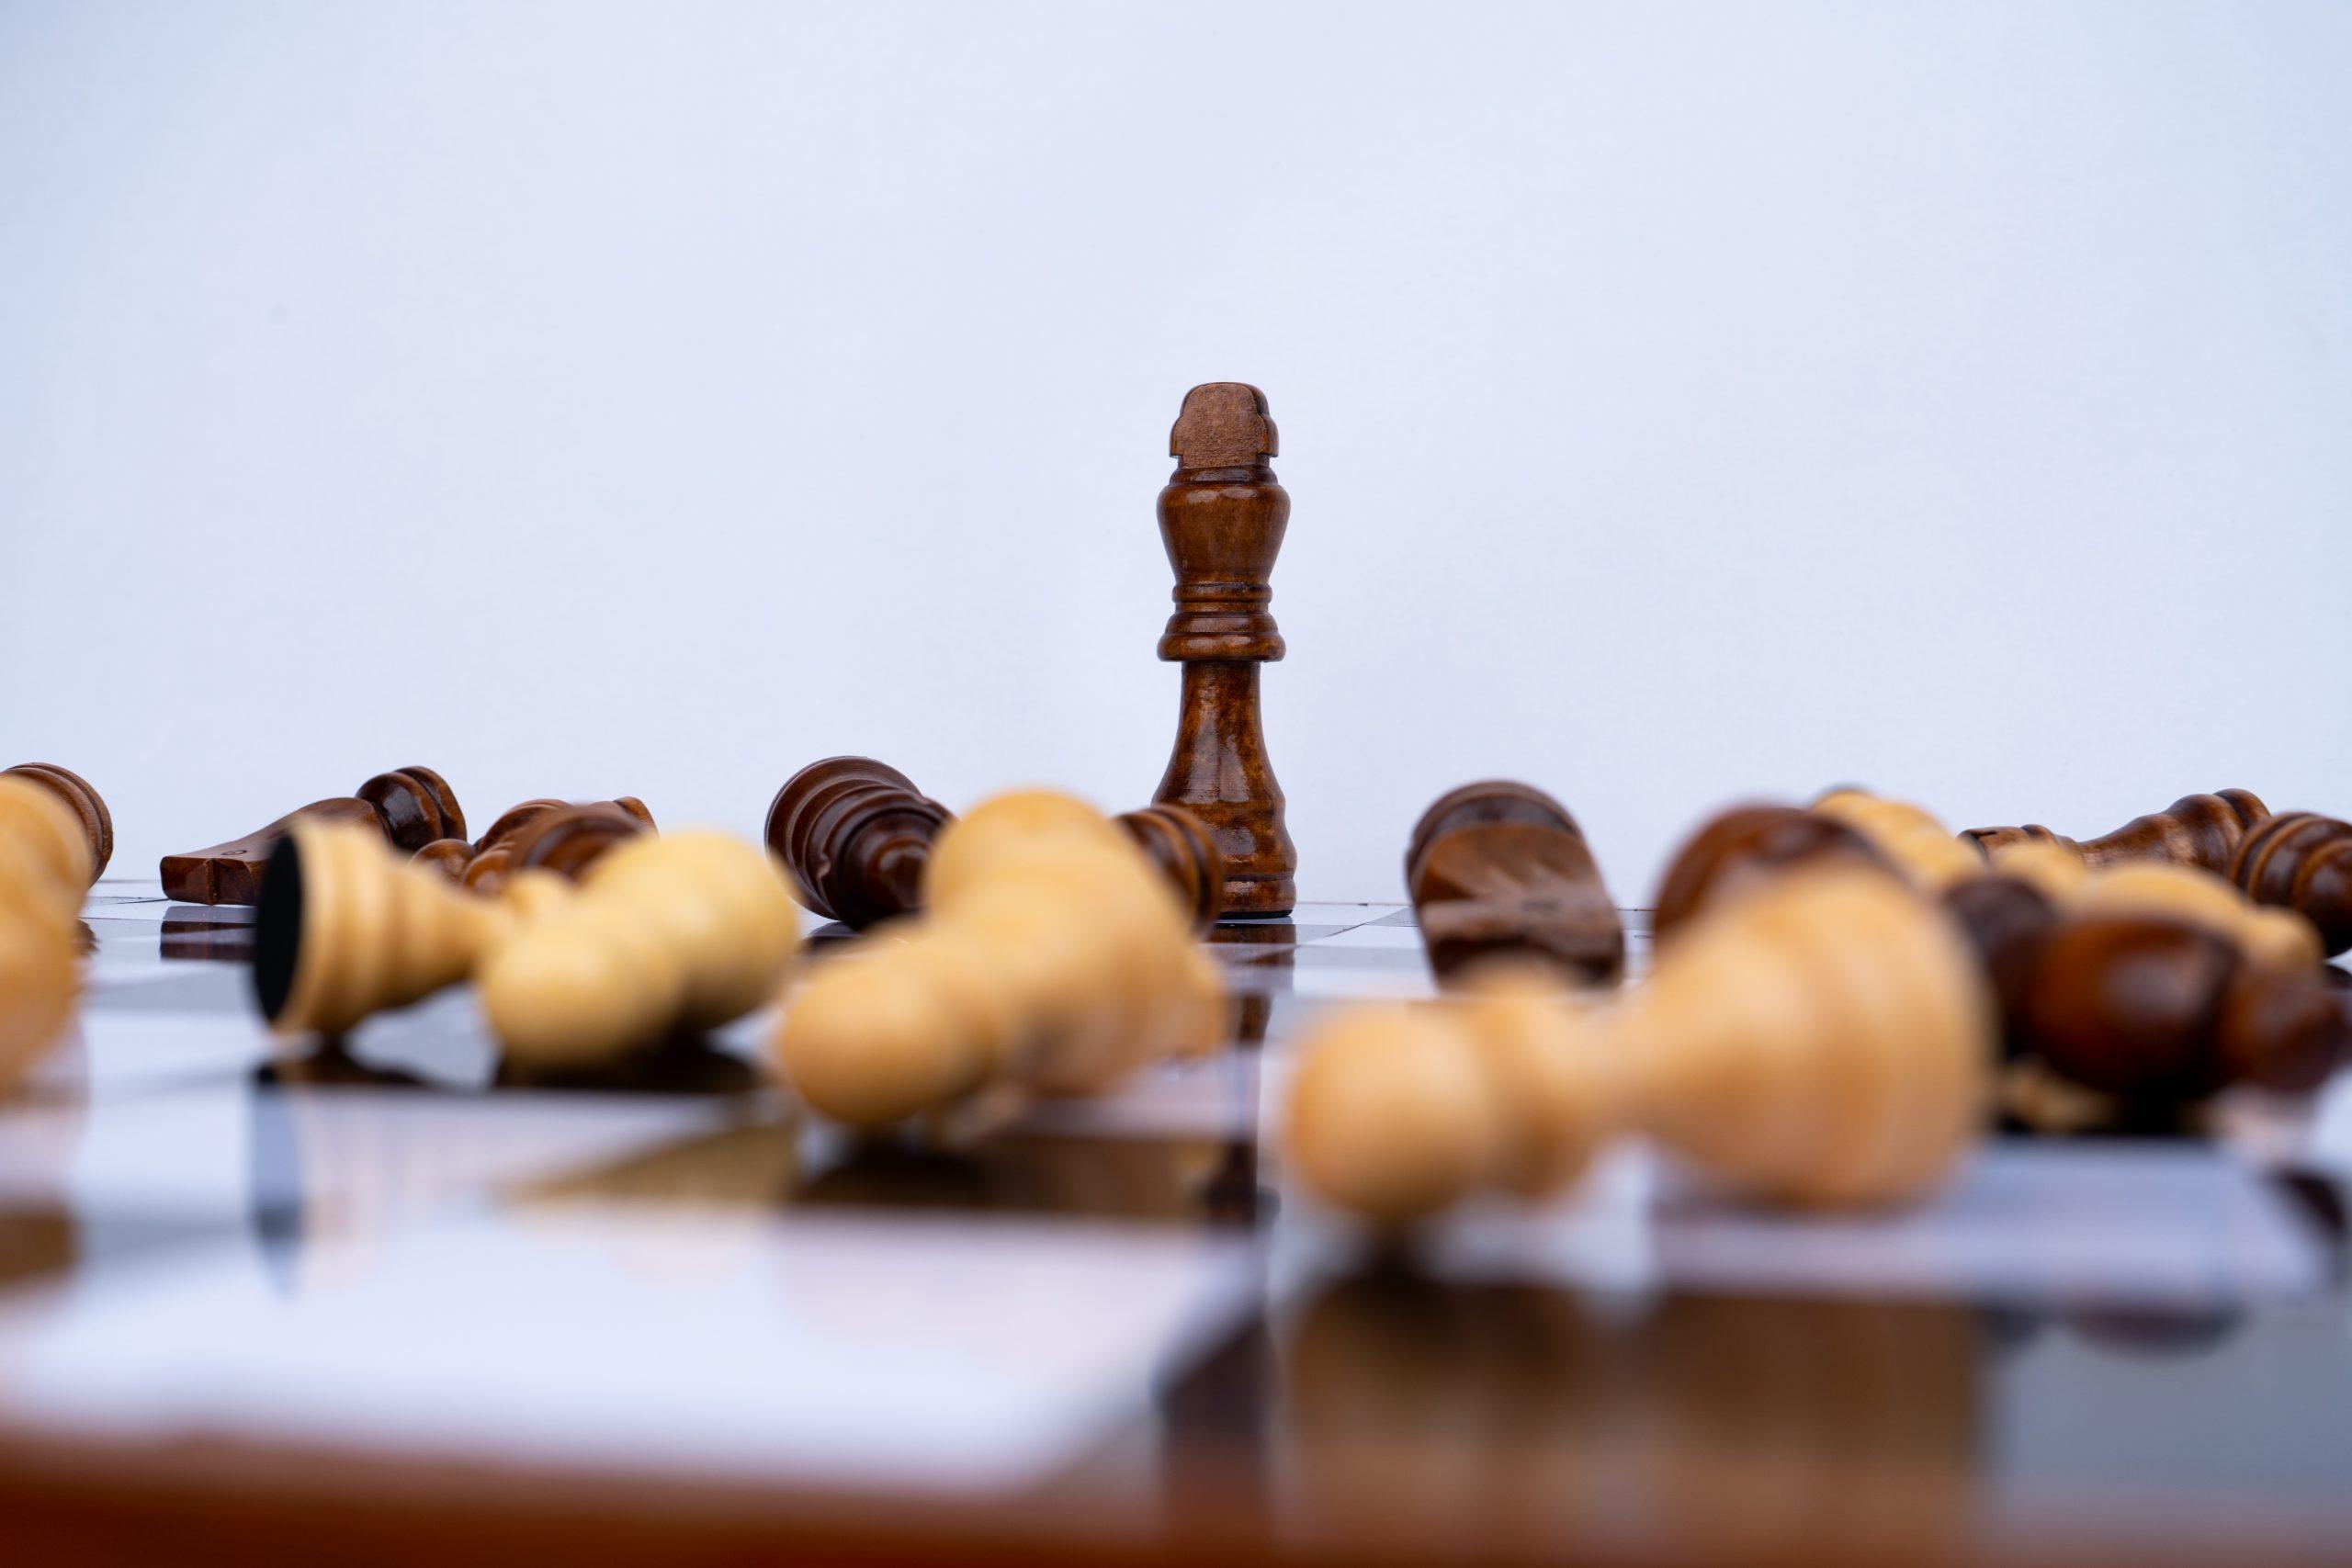 King of chess game - Free Image by Akshay Gupta on PixaHive.com